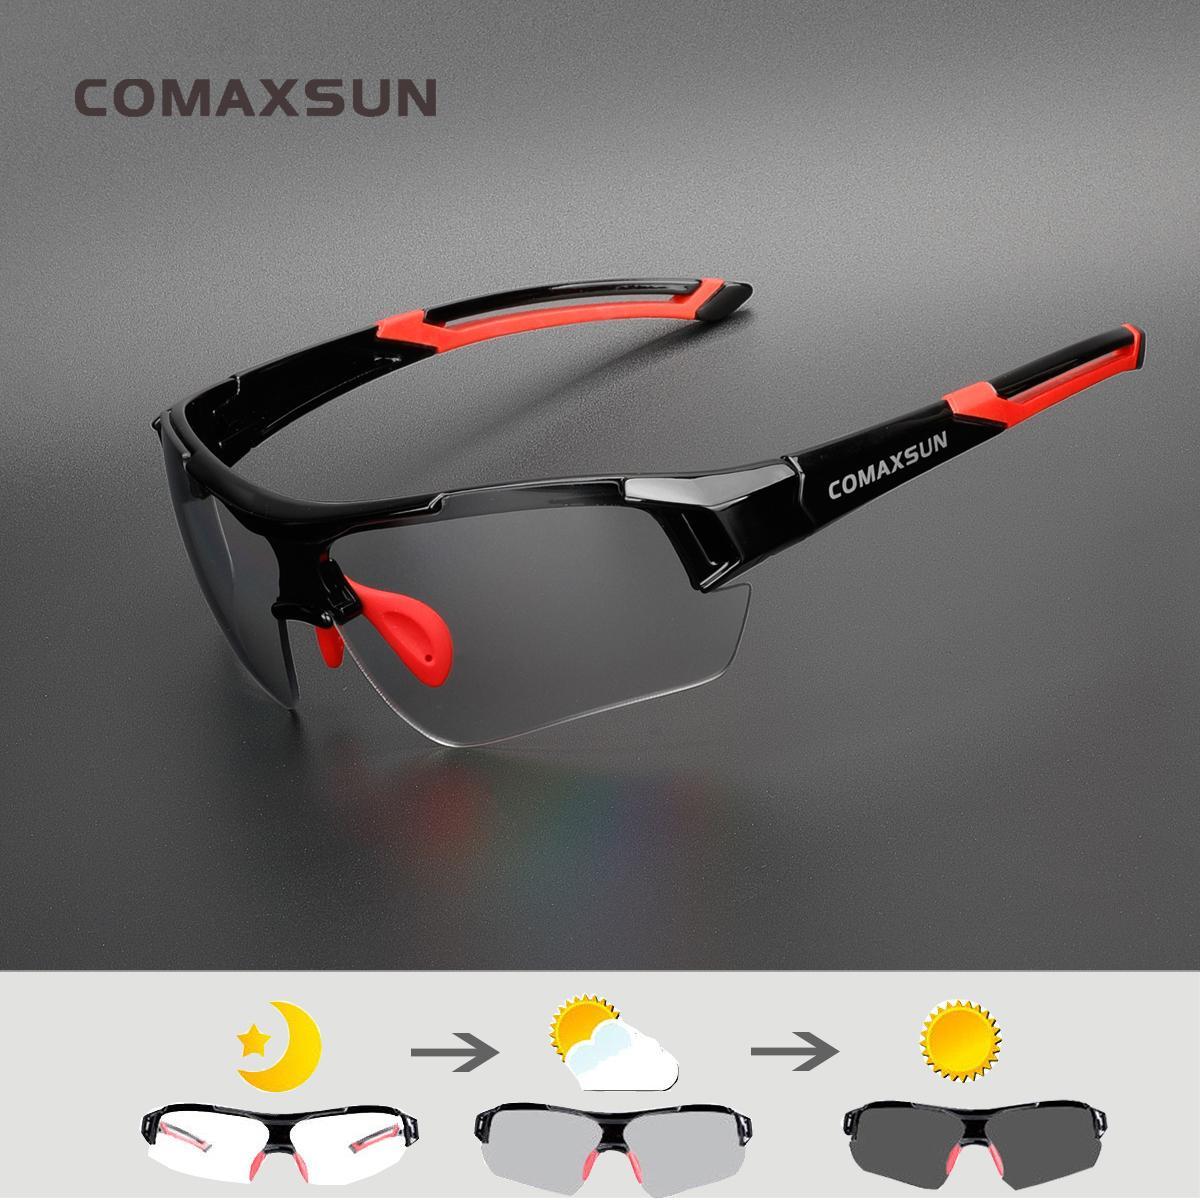 Comaxsun Photographromic Ciclismo Discolor de las gafas MTB Ruta Deporte Gafas de sol Bicicleta Gafas de bicicleta Gafas 2 Estilo